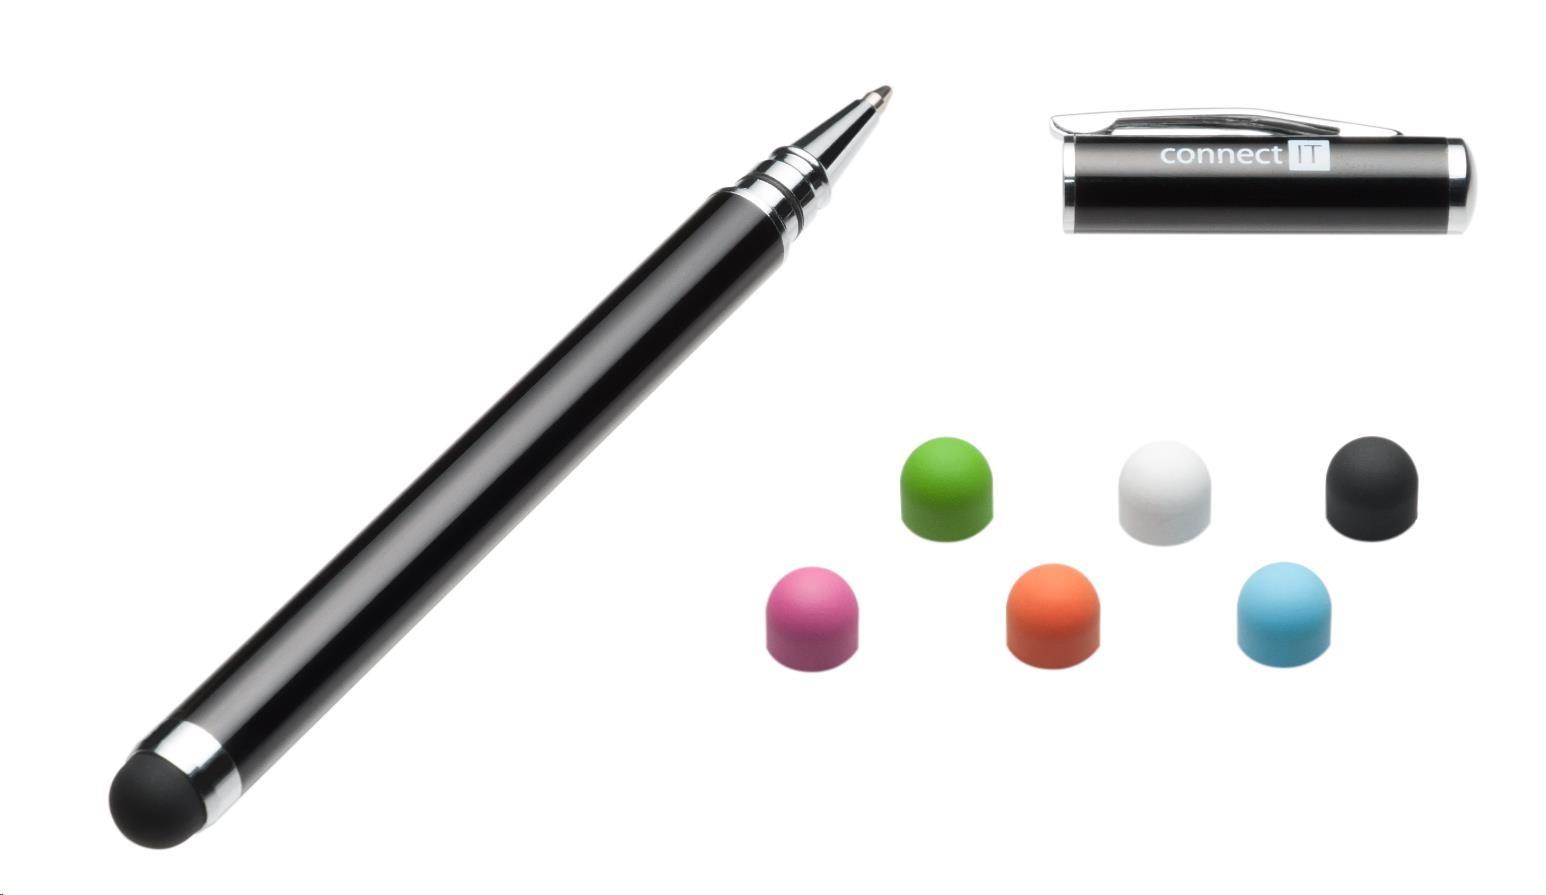 CONNECT IT Stylus kuličkové pero (pero pro dotykové displeje) (CI-171)